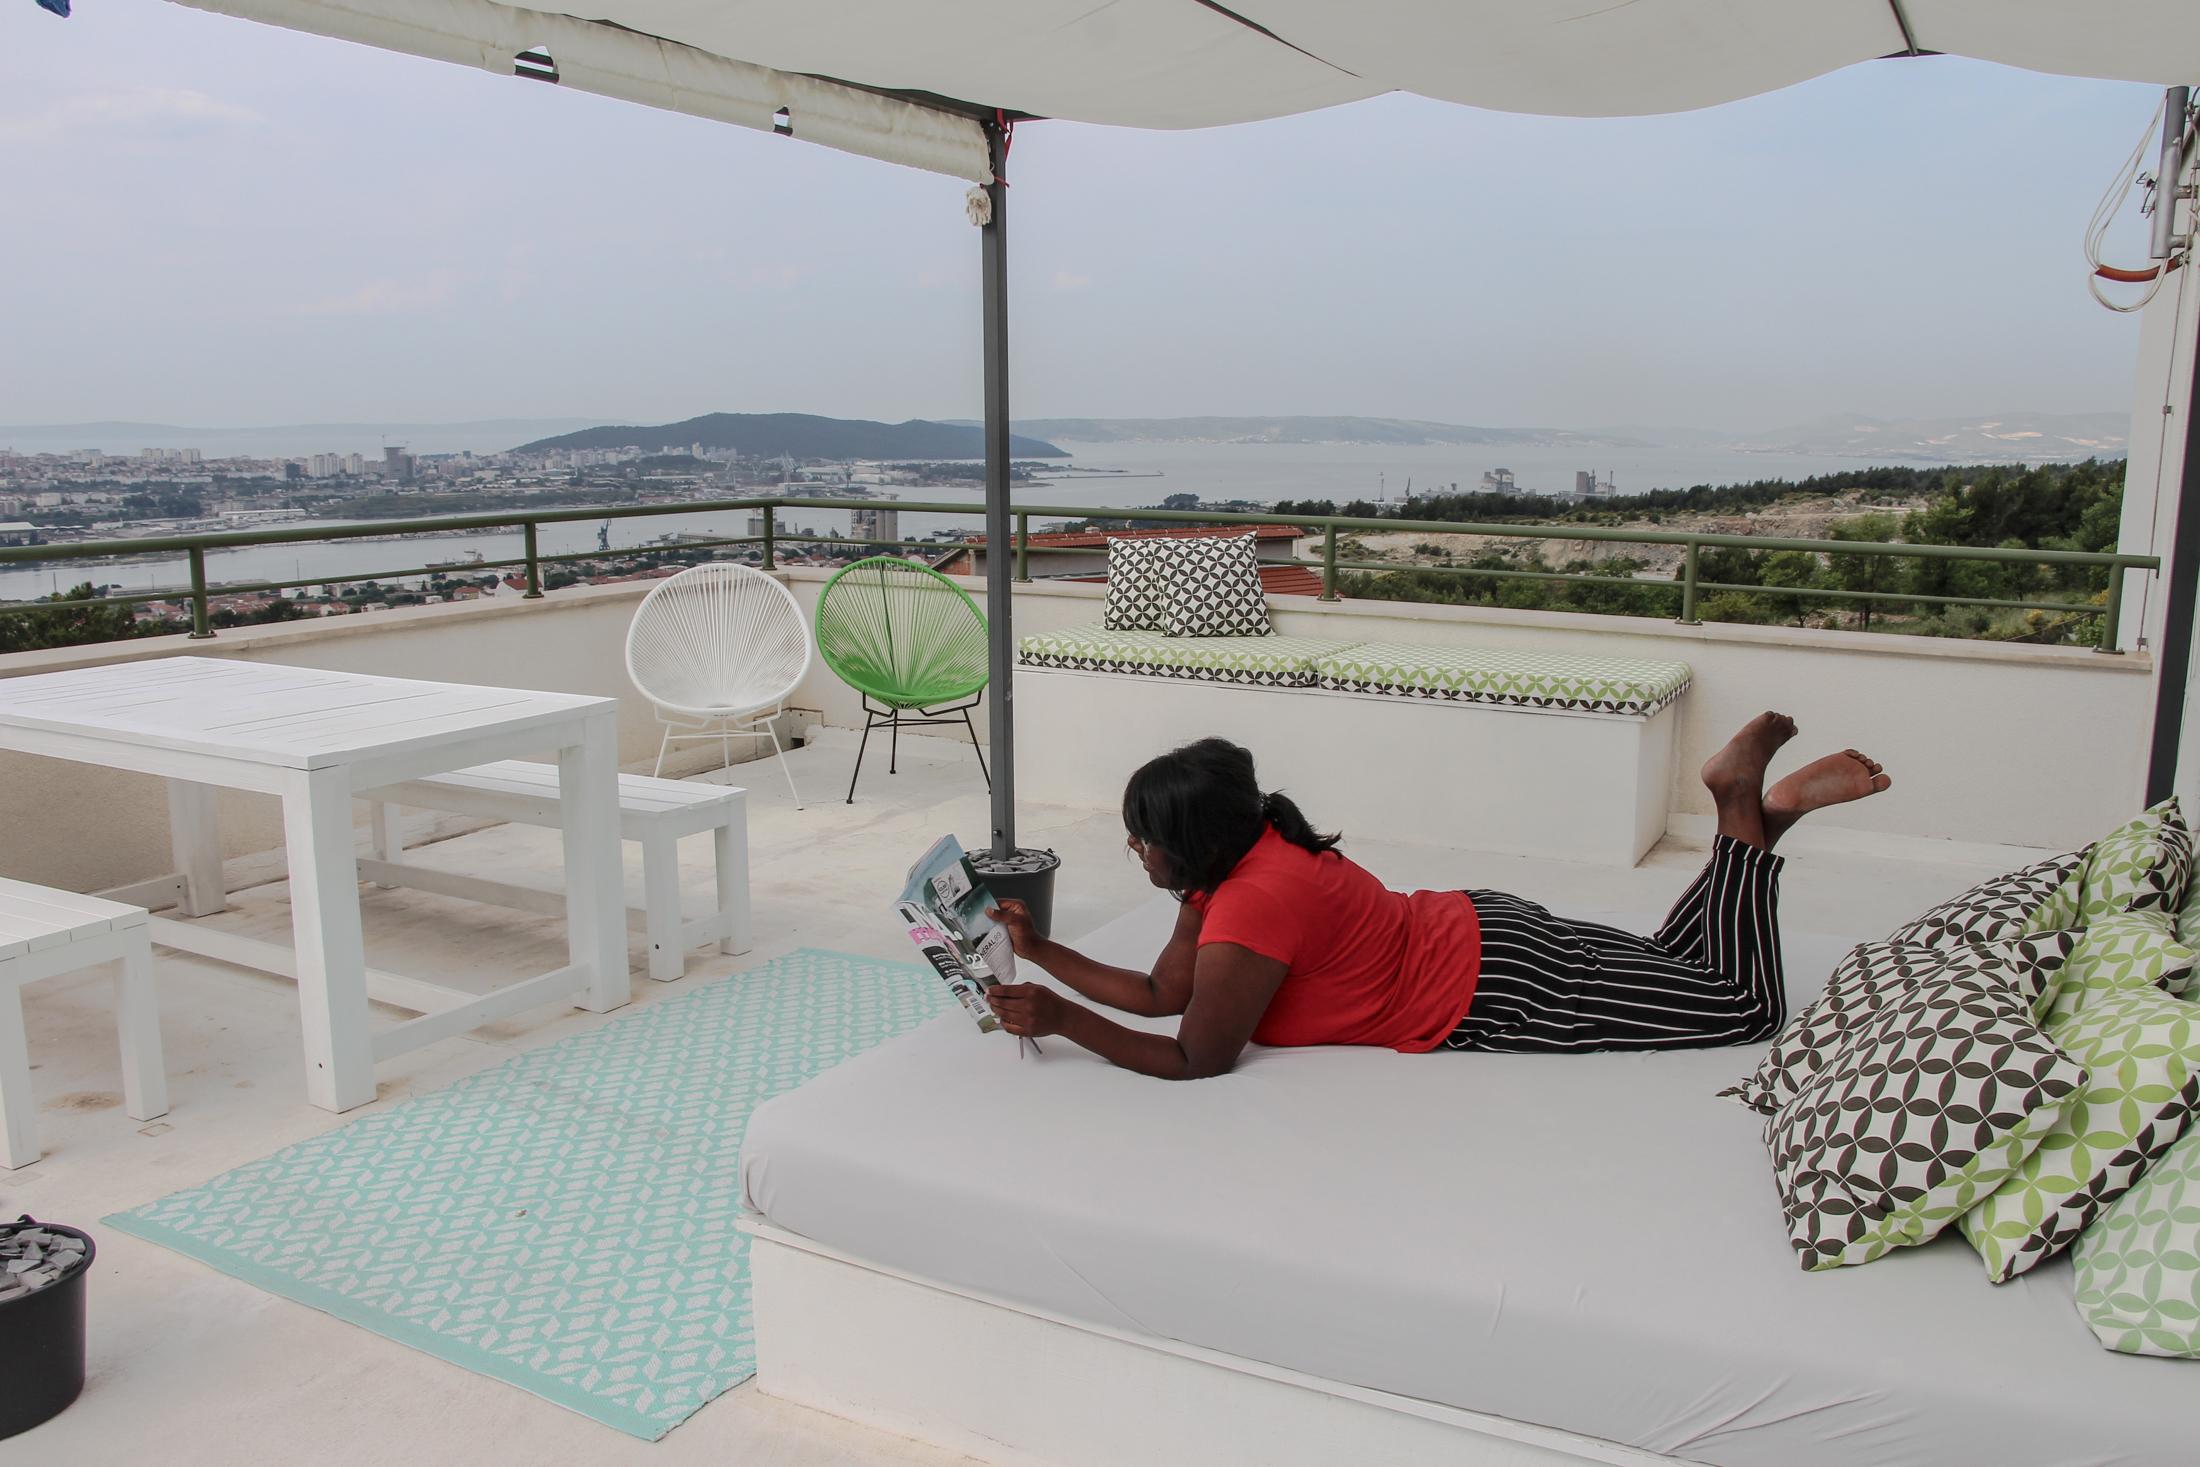 Enjoying the rooftop. ft. @ jyotsnadj